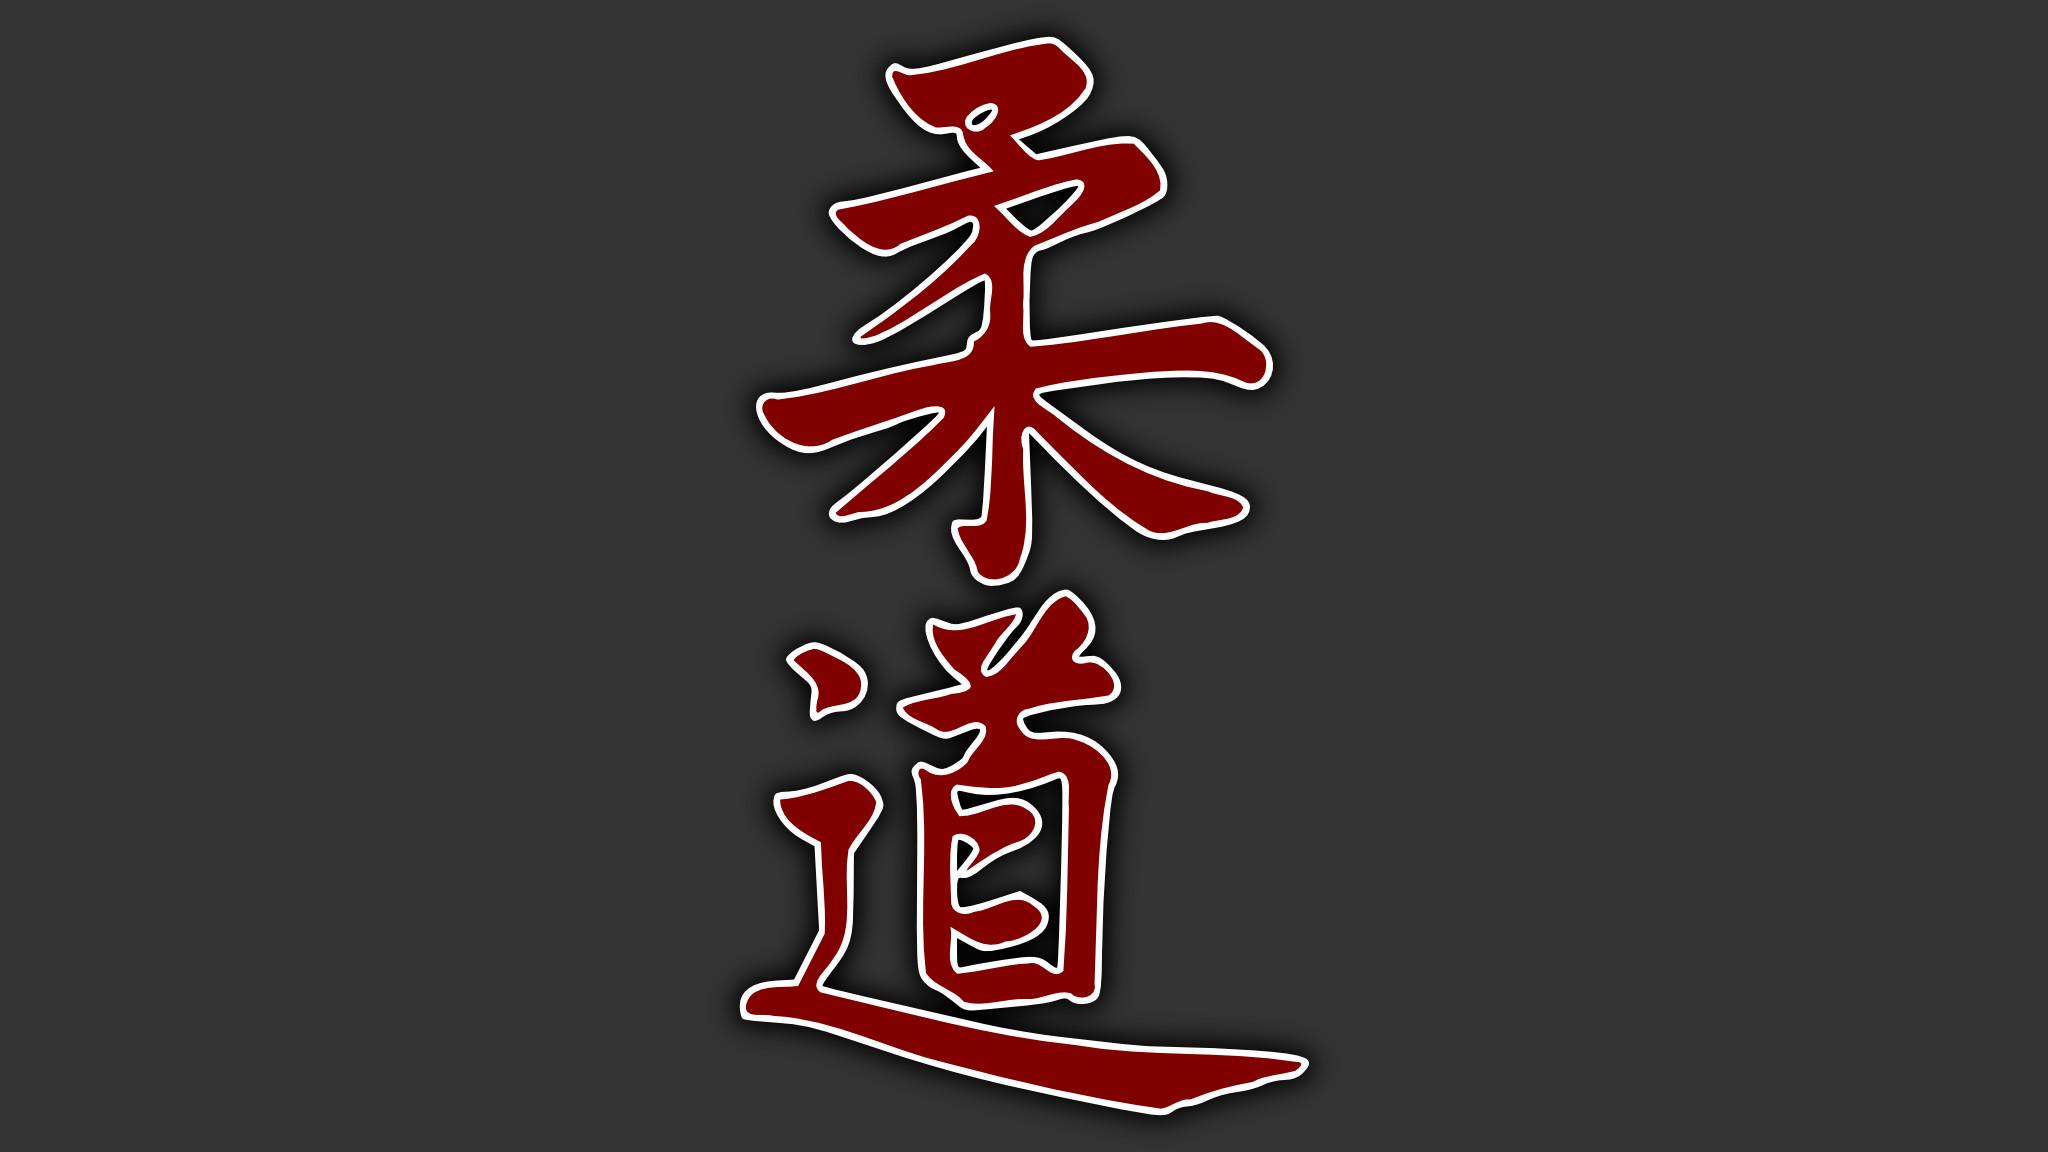 3d Kickboxing Wallpaper Judo Wallpaper 183 ① Wallpapertag